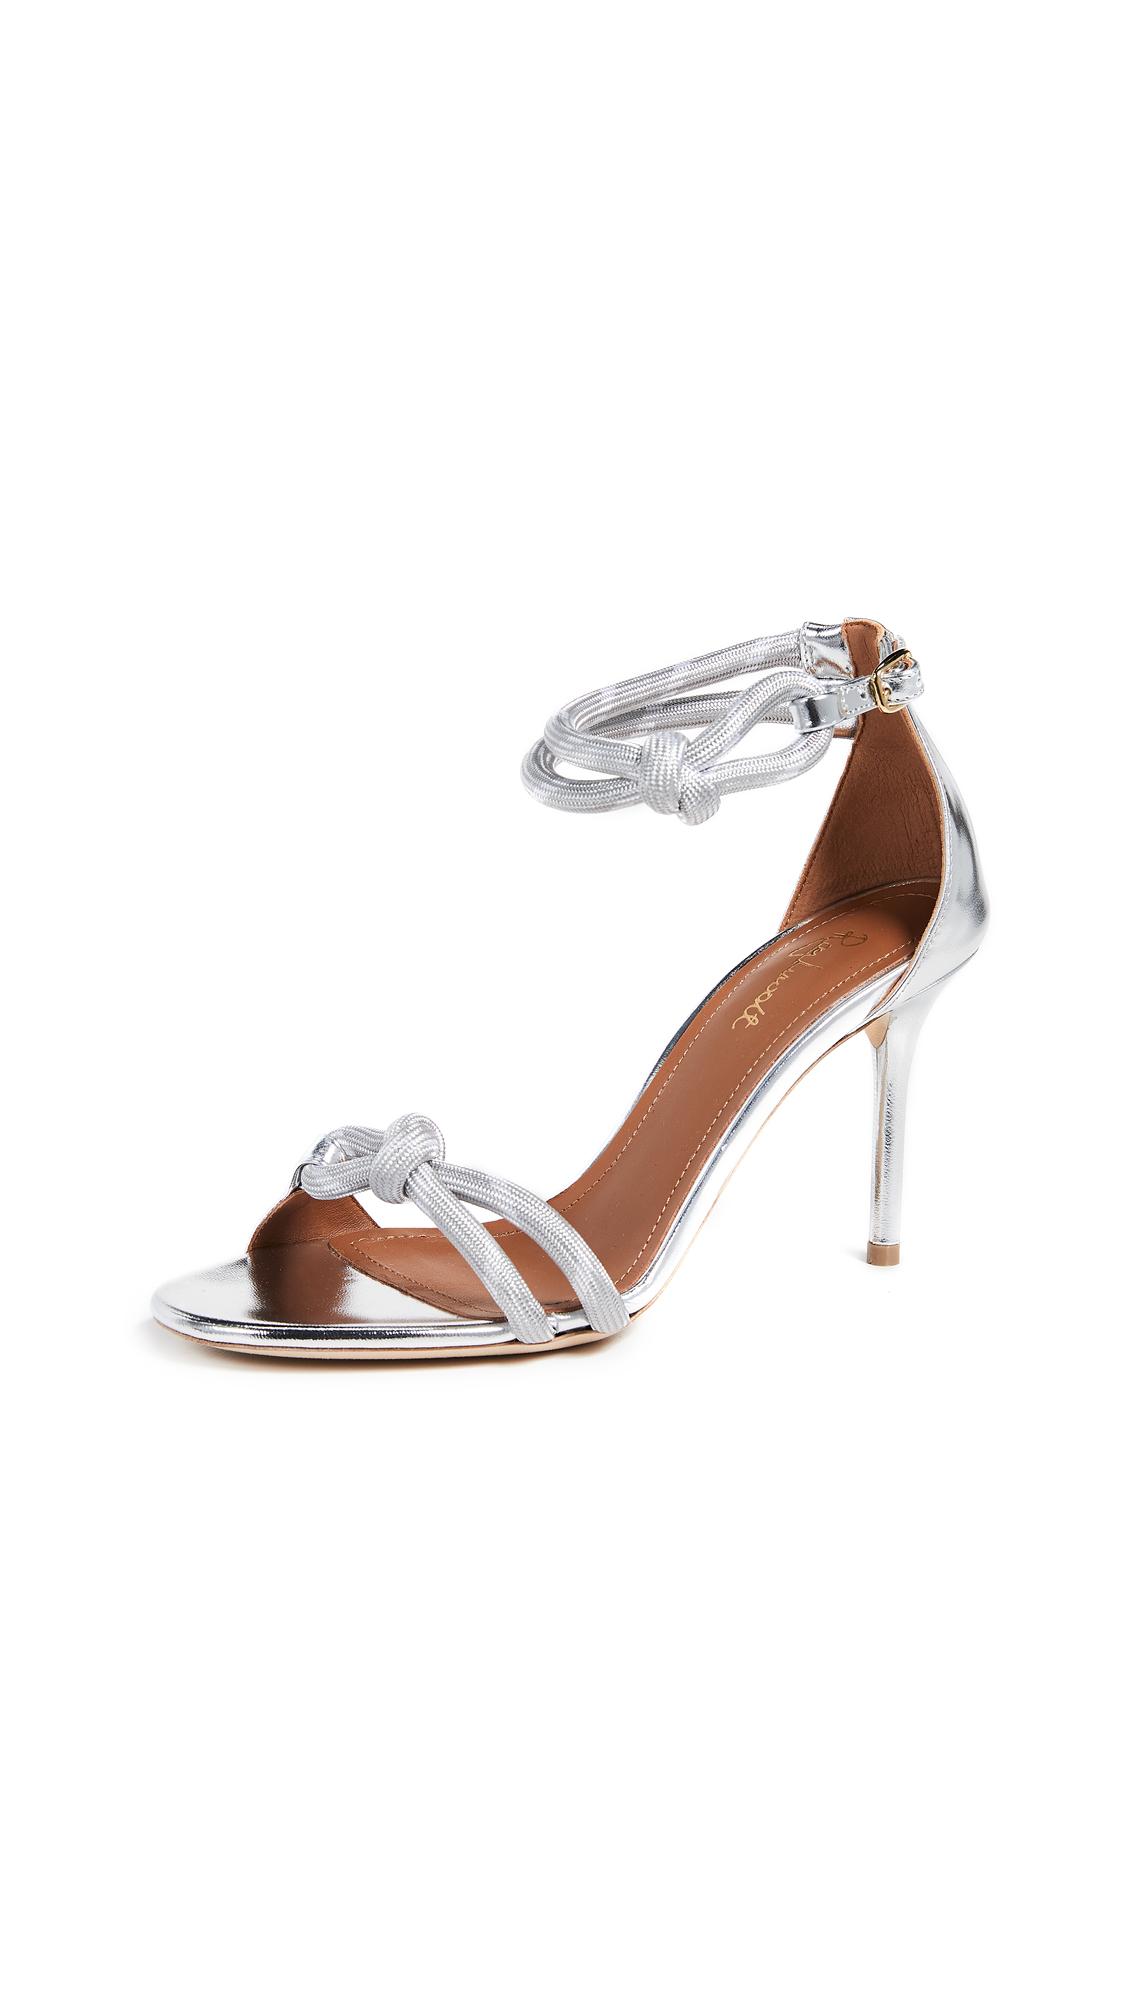 Malone Souliers Filipa 85 Sandals - Grey/Silver